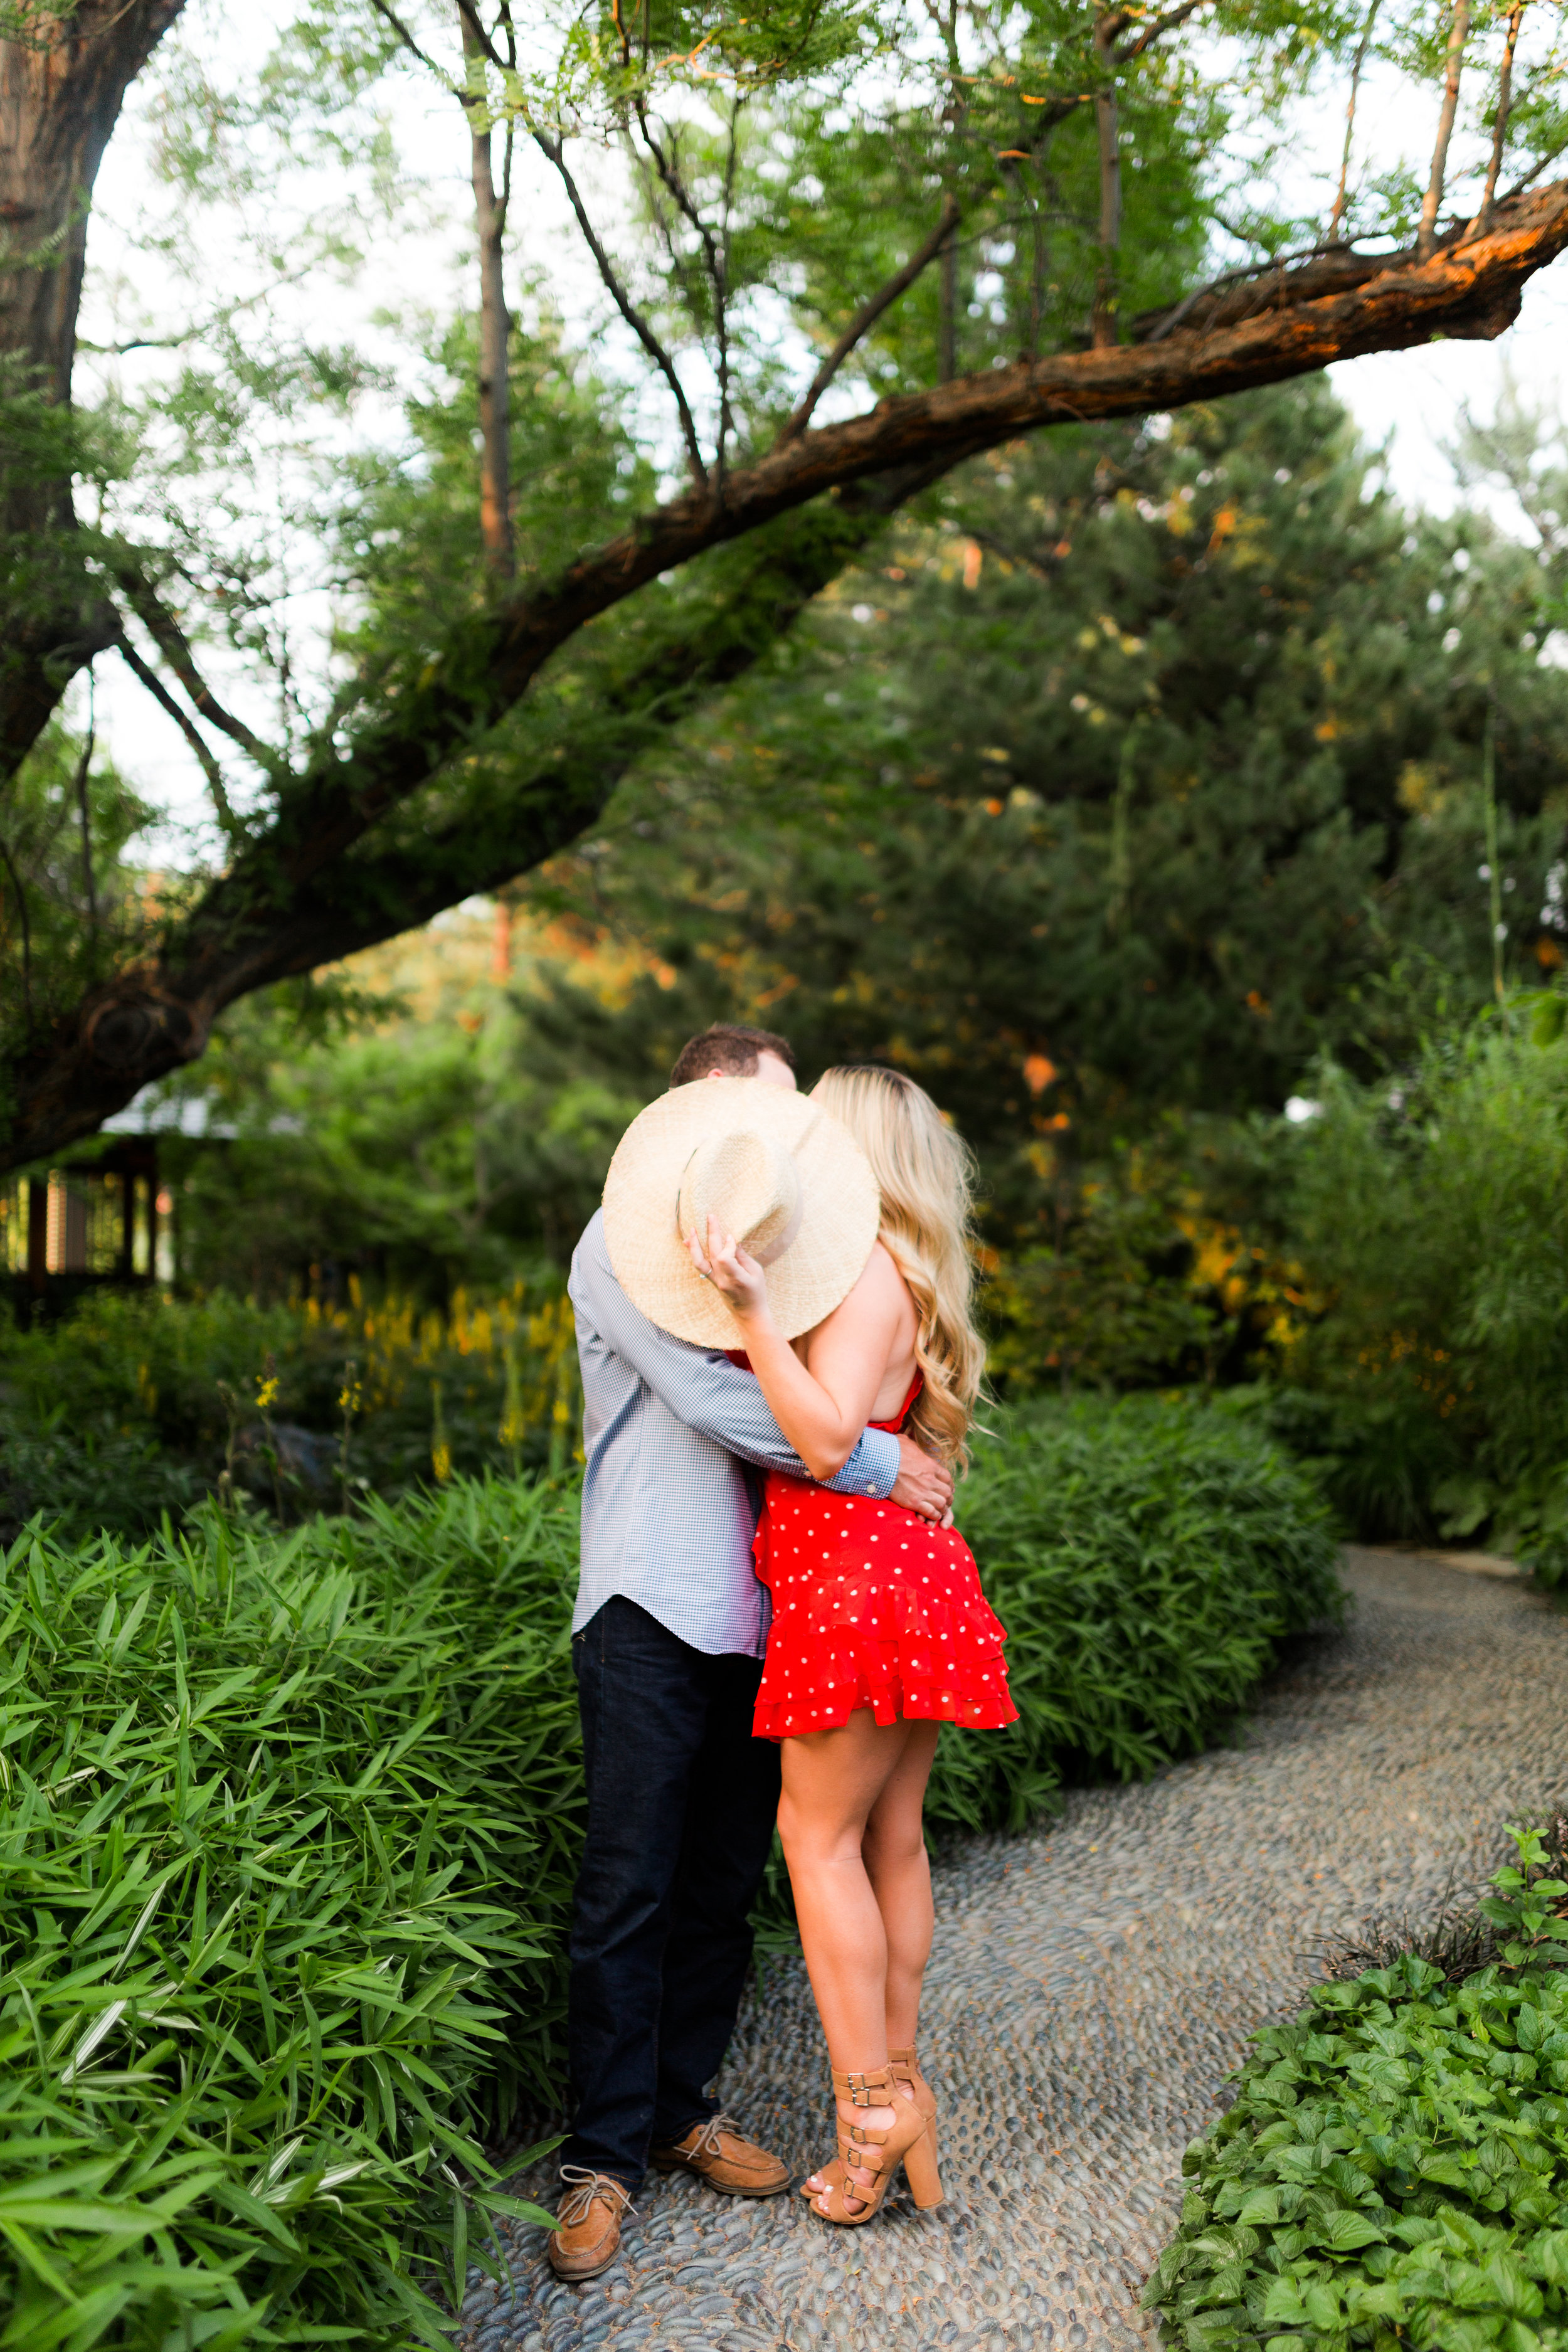 Sweet_Like_Pie_Greenberg_Denver_Botanic_Gardens_Engagement_Photos-151.jpg